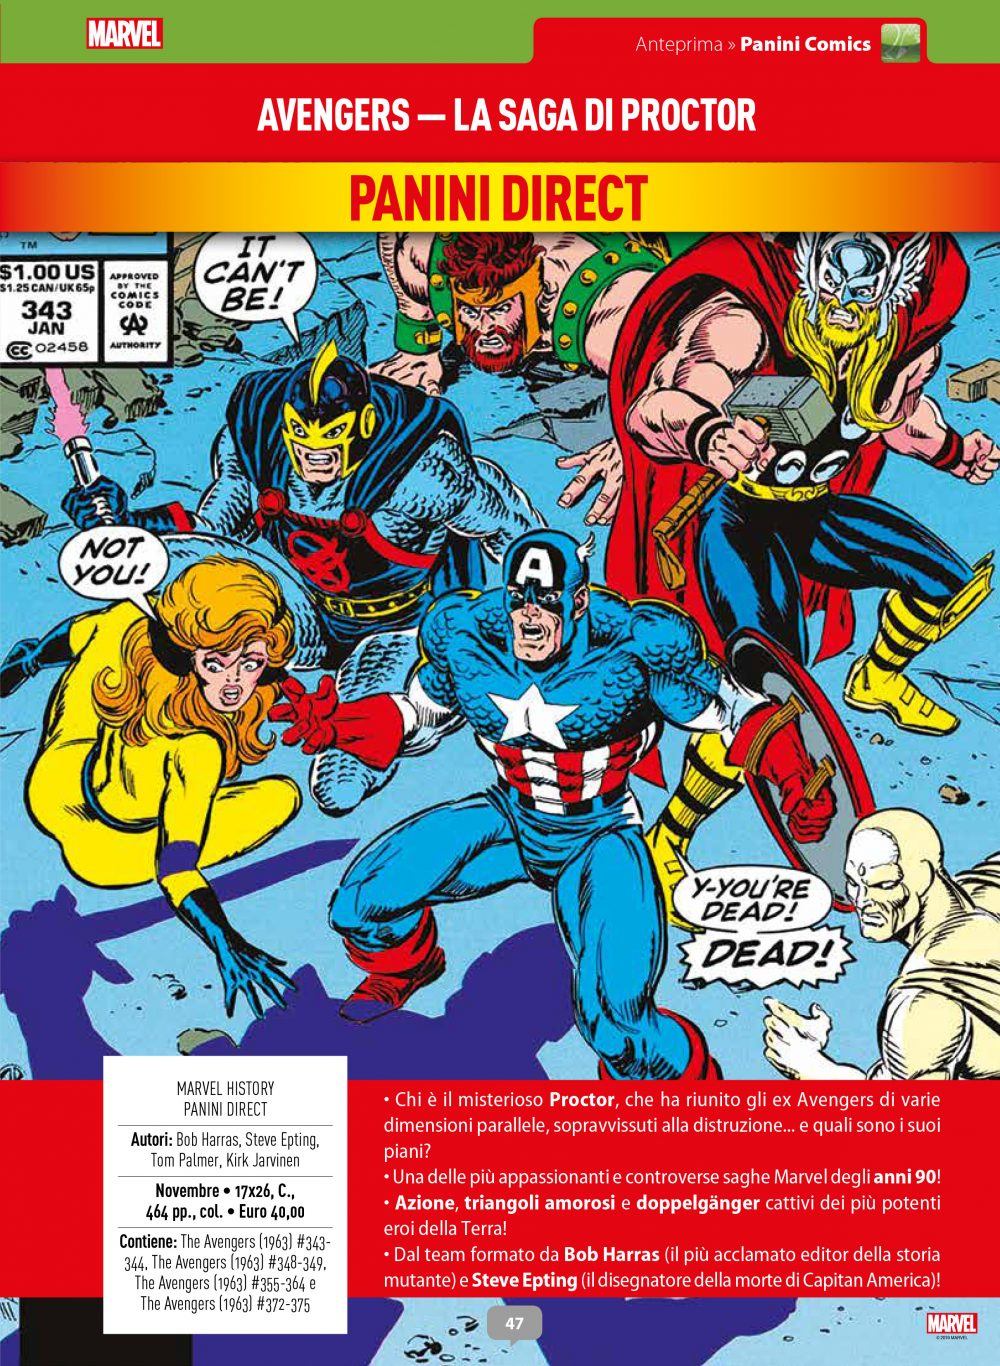 Avengers: la saga di Proctor su Anteprima